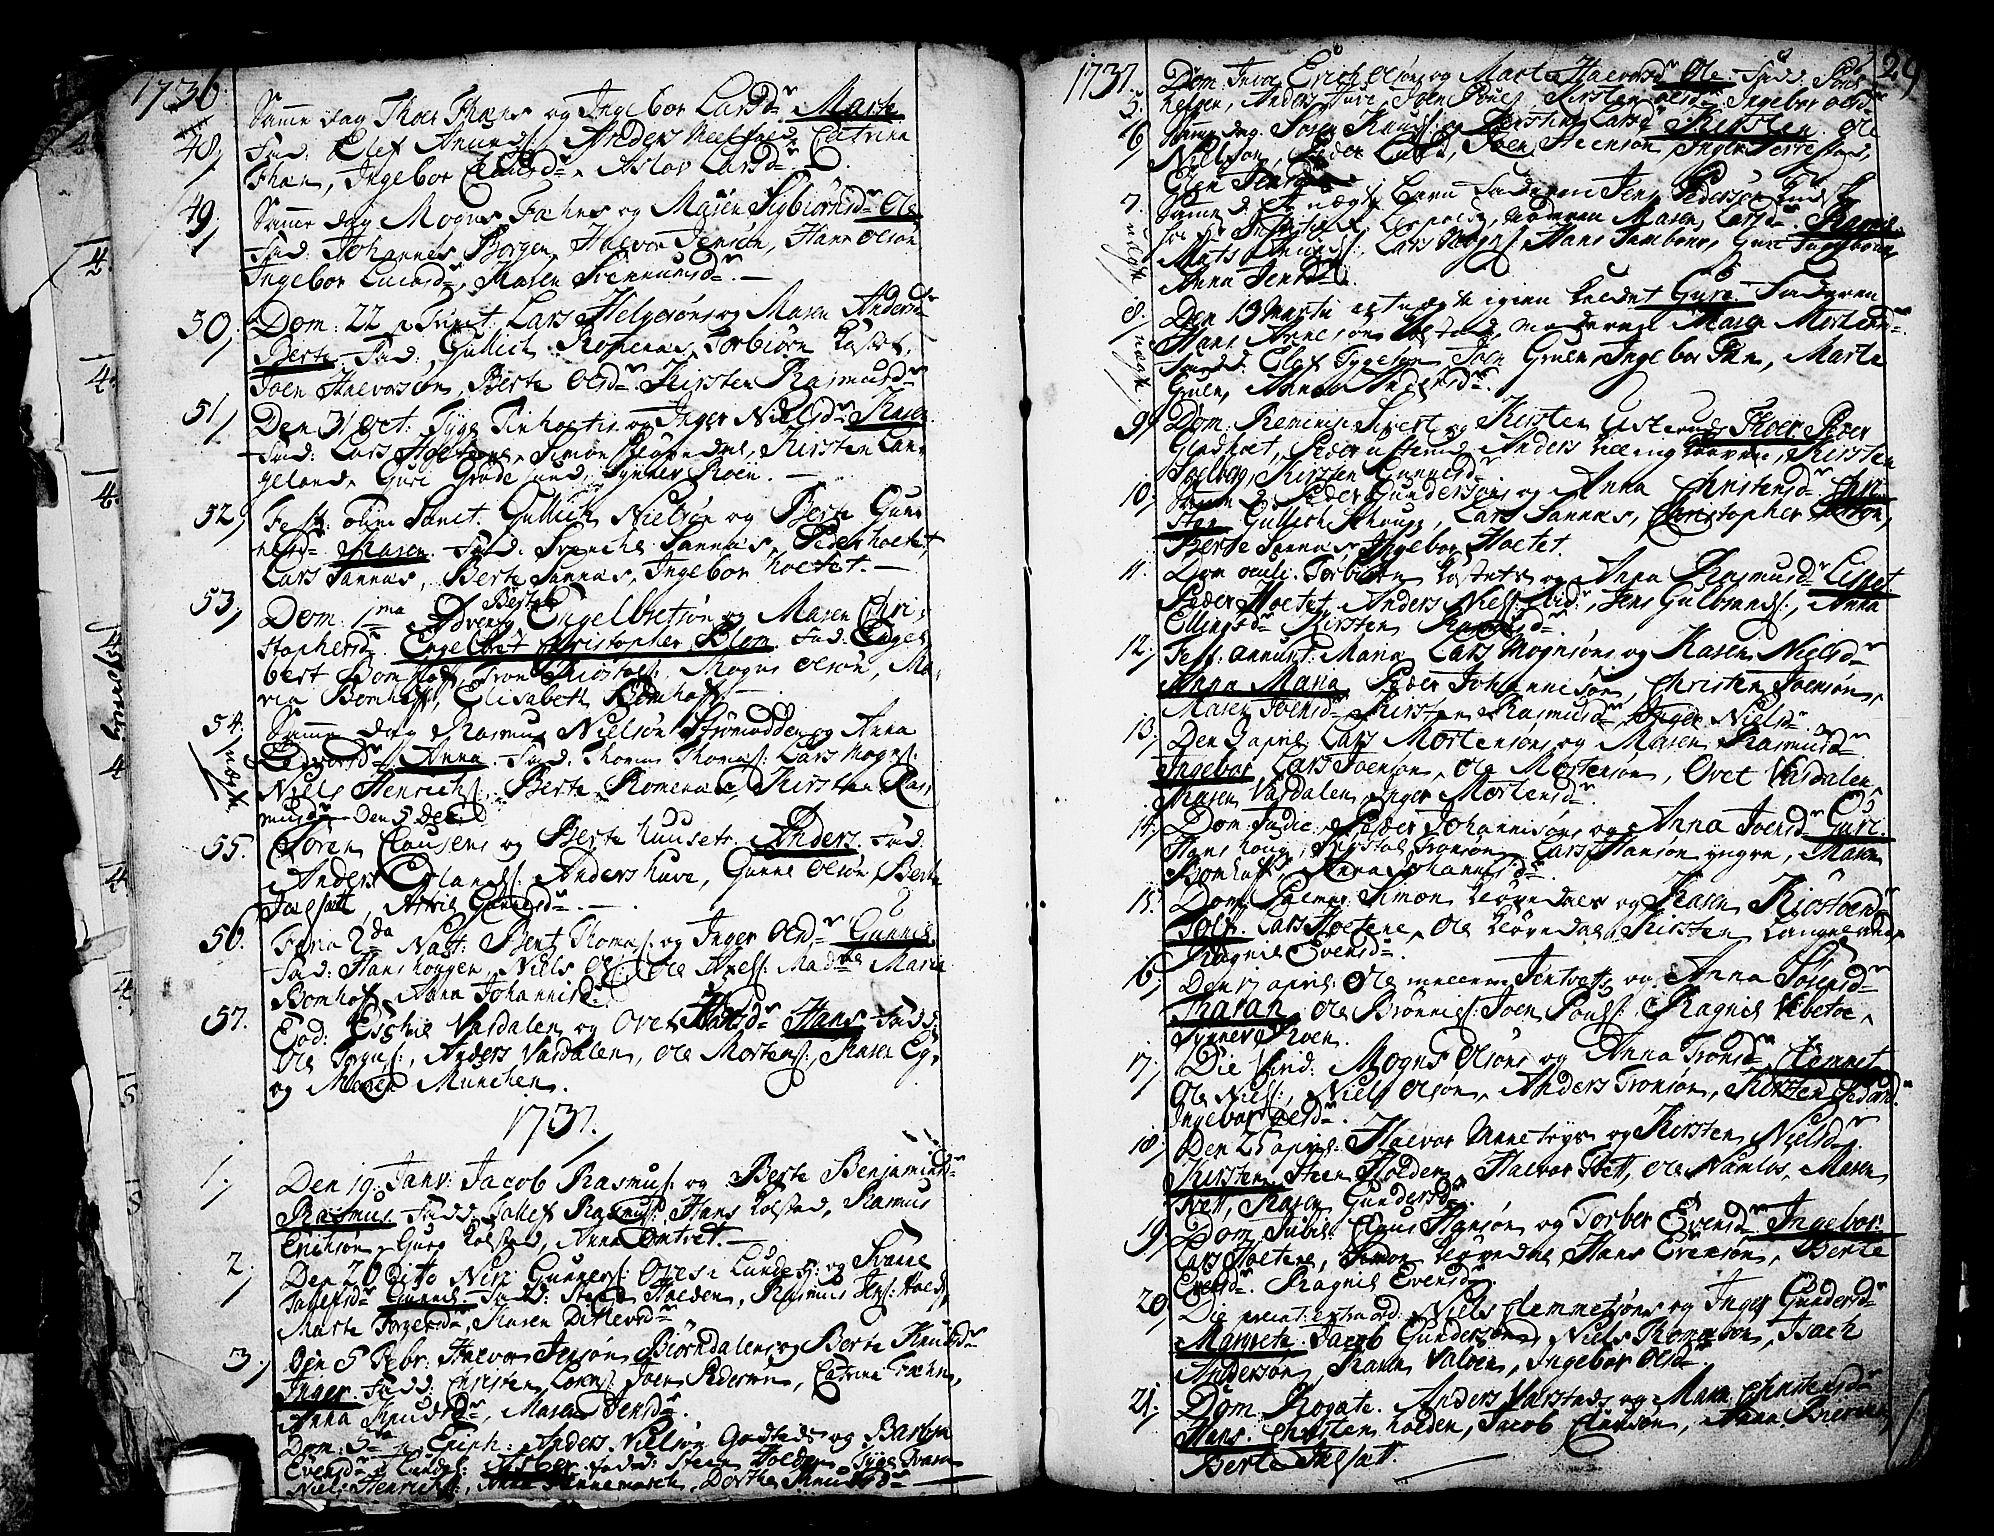 SAKO, Holla kirkebøker, F/Fa/L0001: Ministerialbok nr. 1, 1717-1779, s. 29